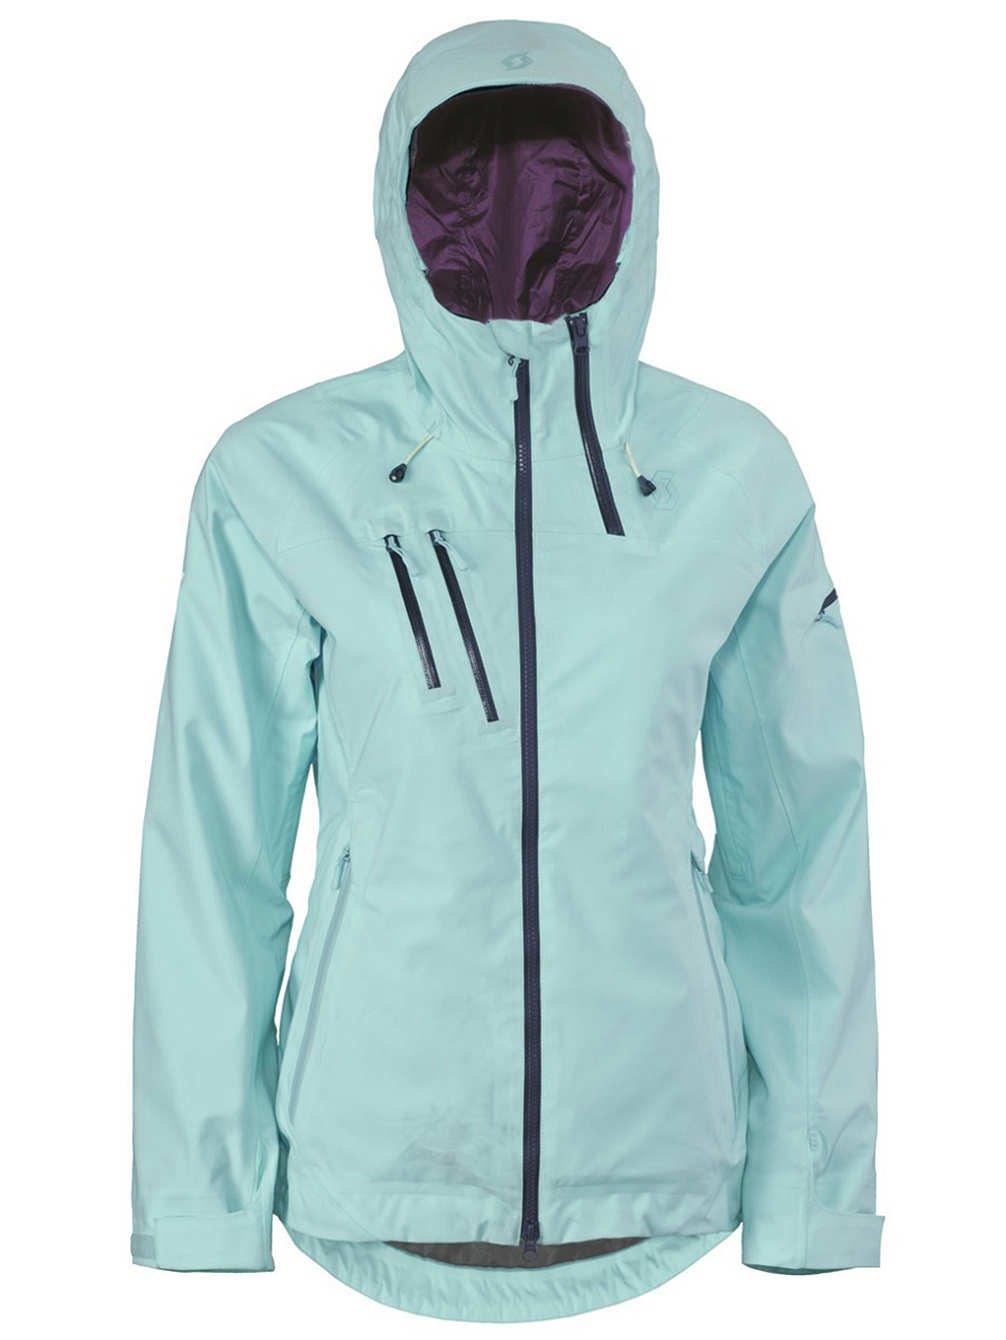 Damen Snowboard Jacke Scott Quorra Jacket jetzt bestellen